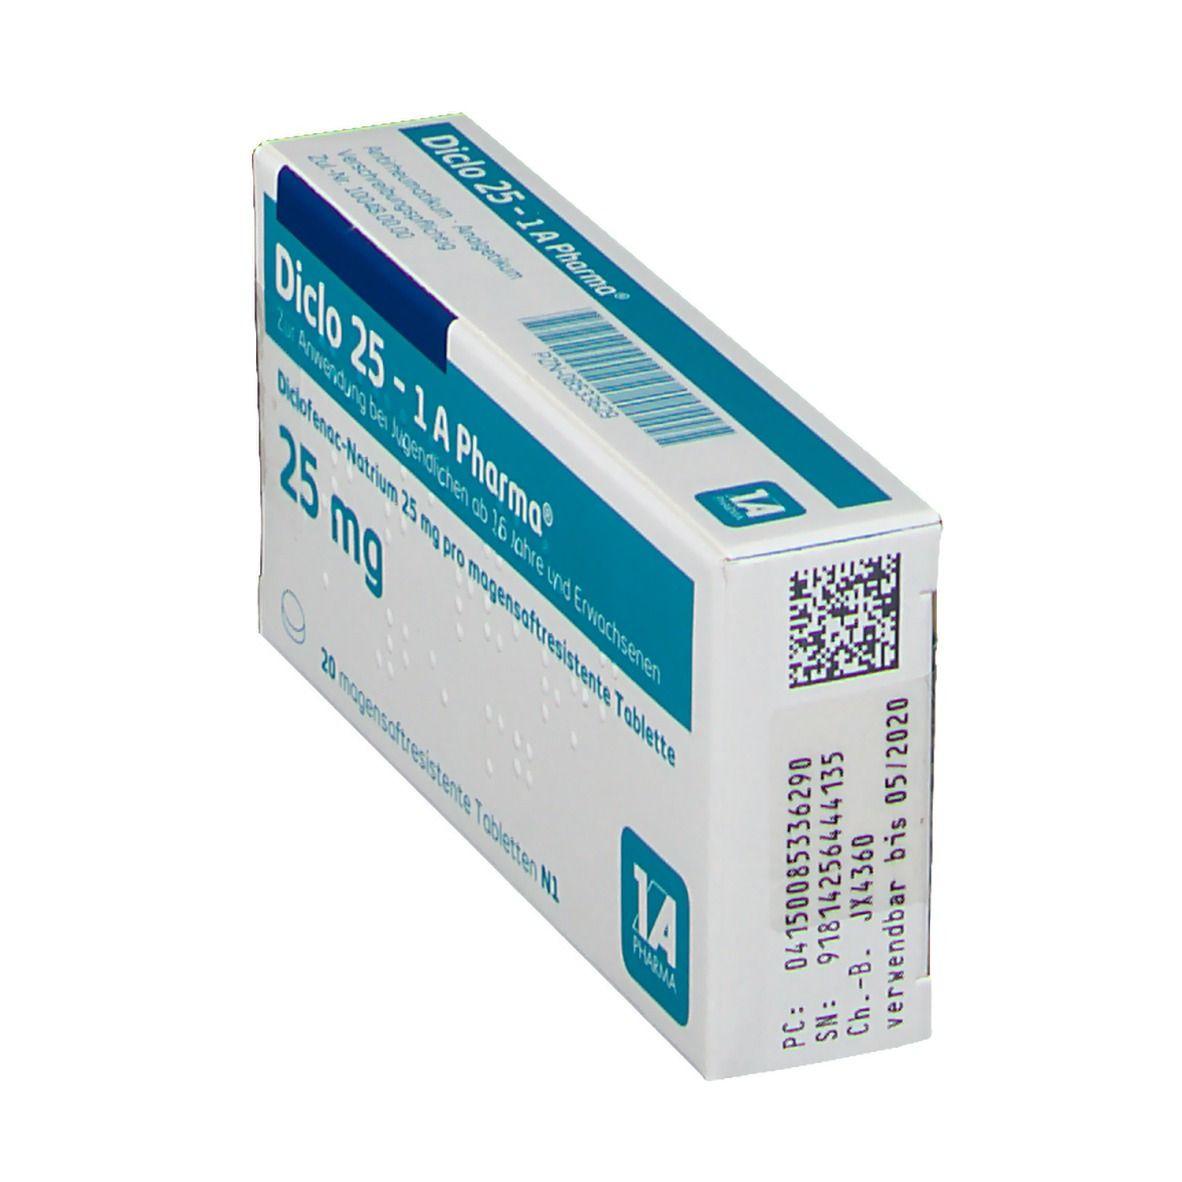 Diclo 25 1a Pharma Tabletten